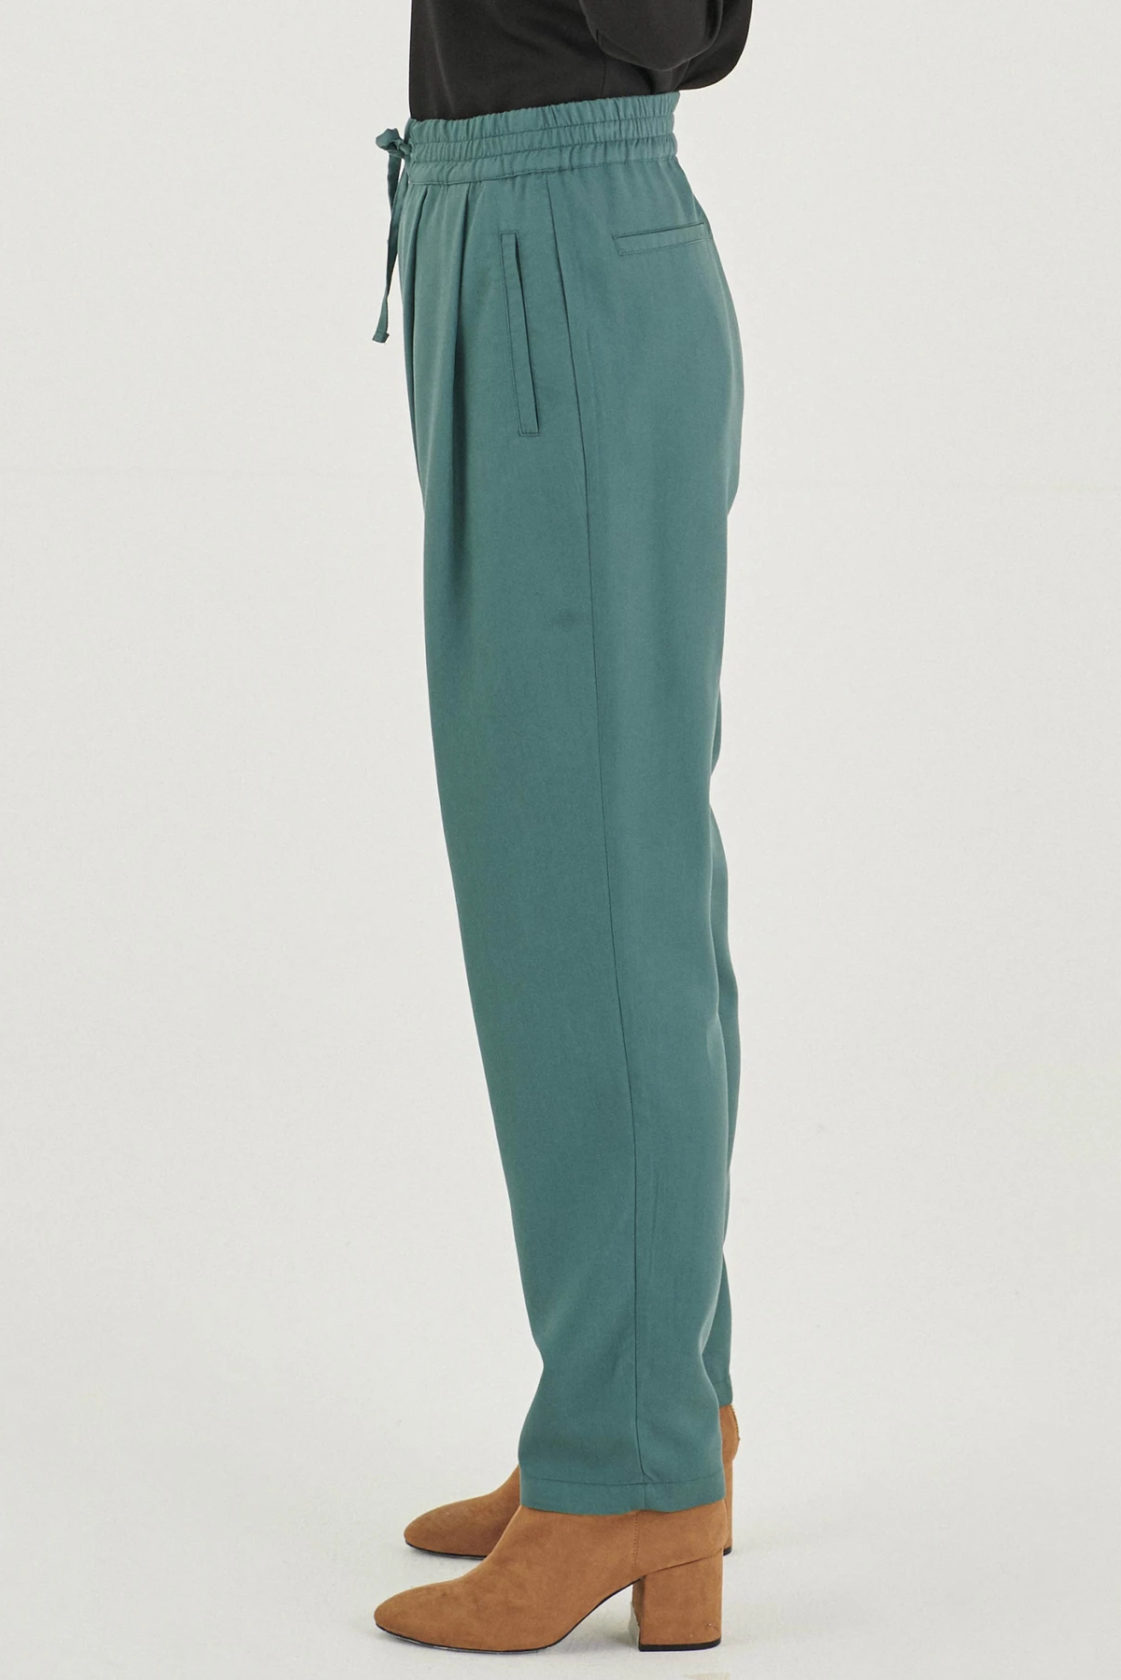 Roberta Organic Fashion Organication Hose Seaweed 2